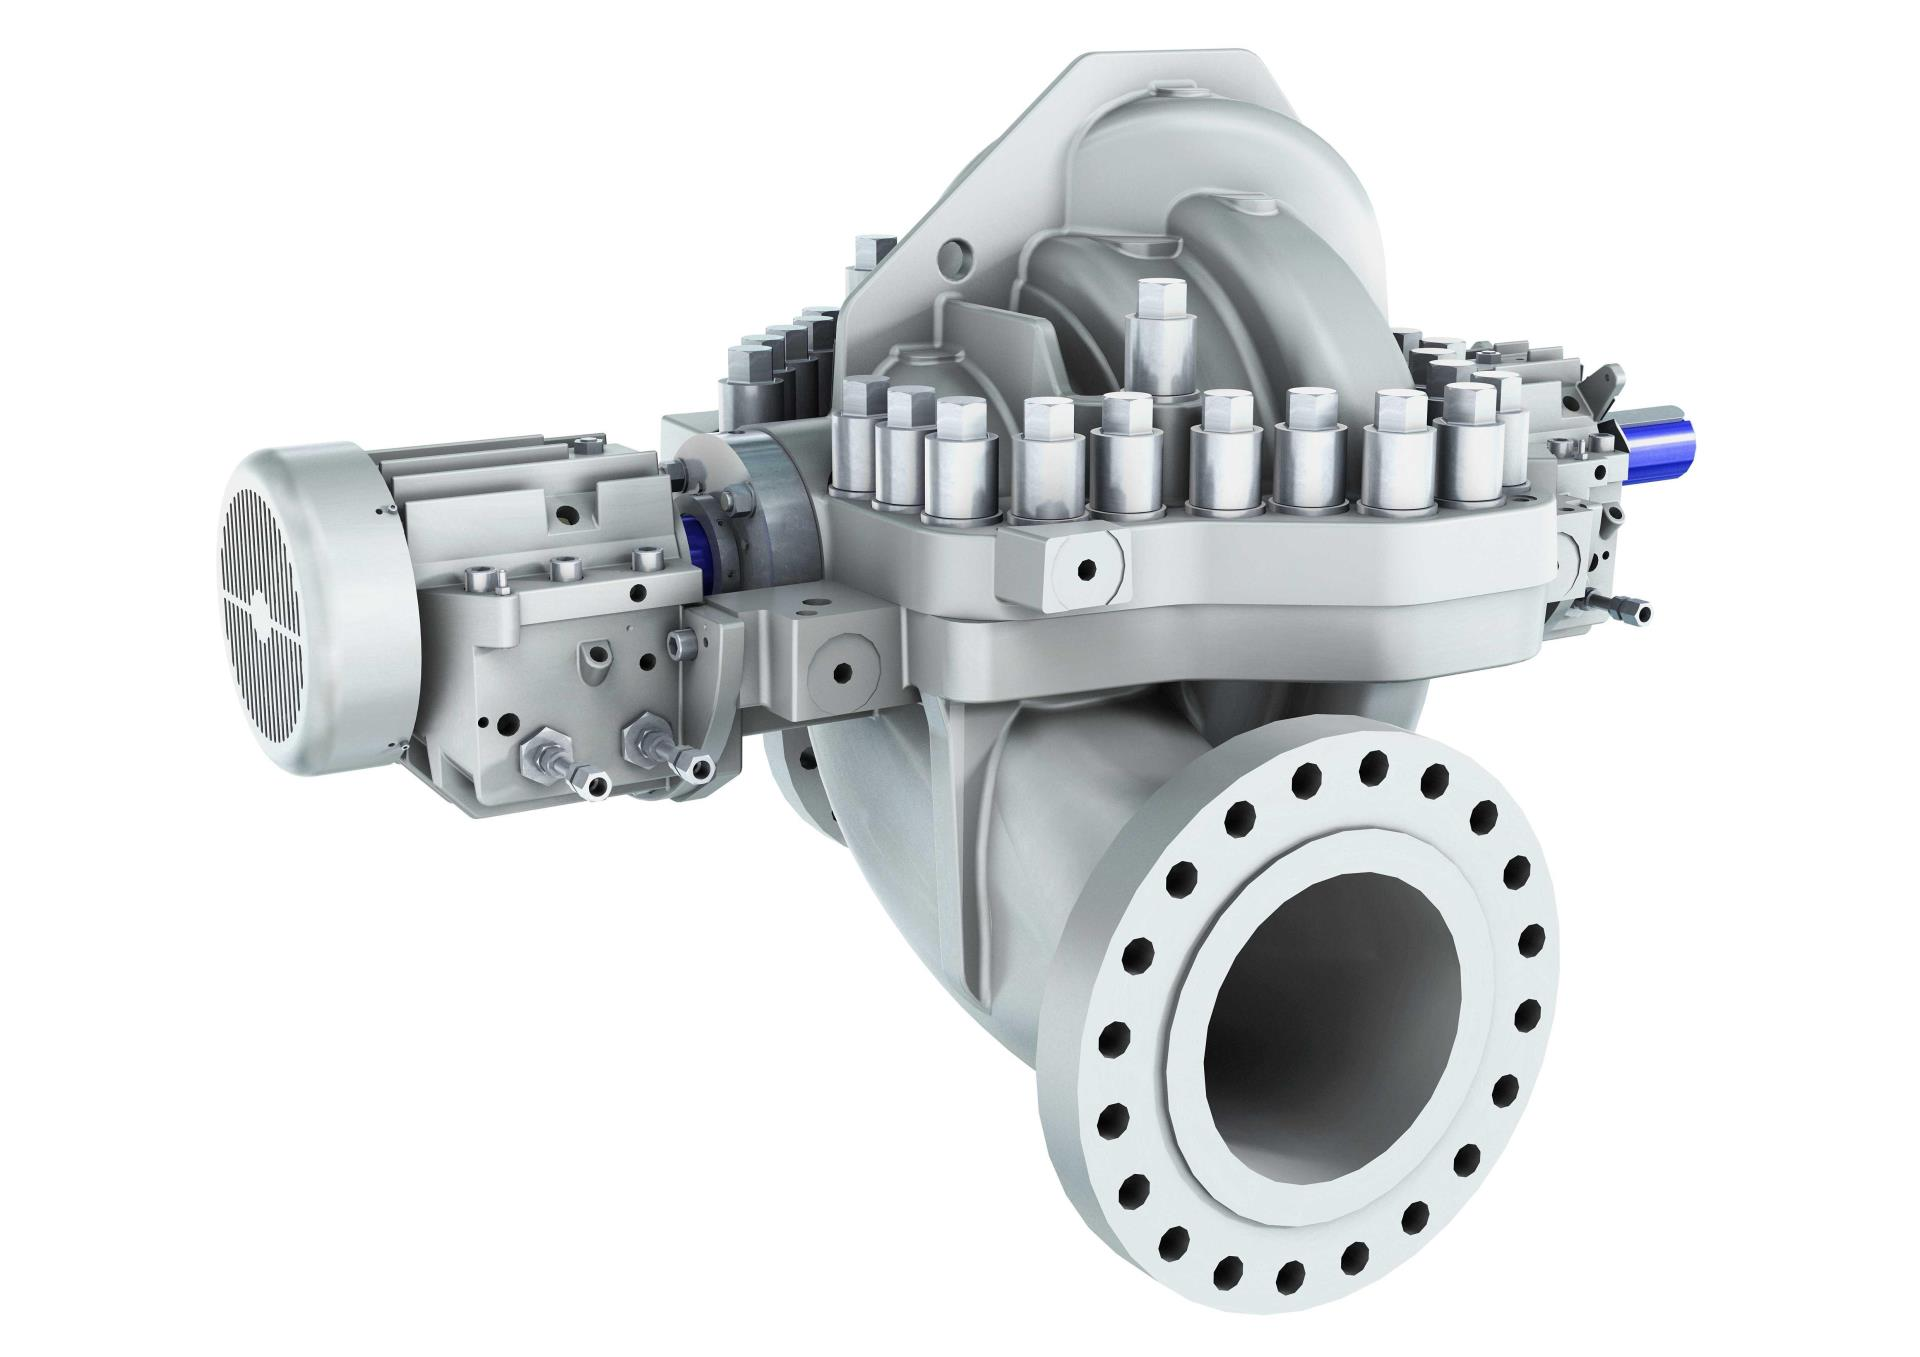 msd ro axially split multistage pump sulzer rh sulzer com Bingham Pump Company Bbt-D Sulzer Pump Dimensions